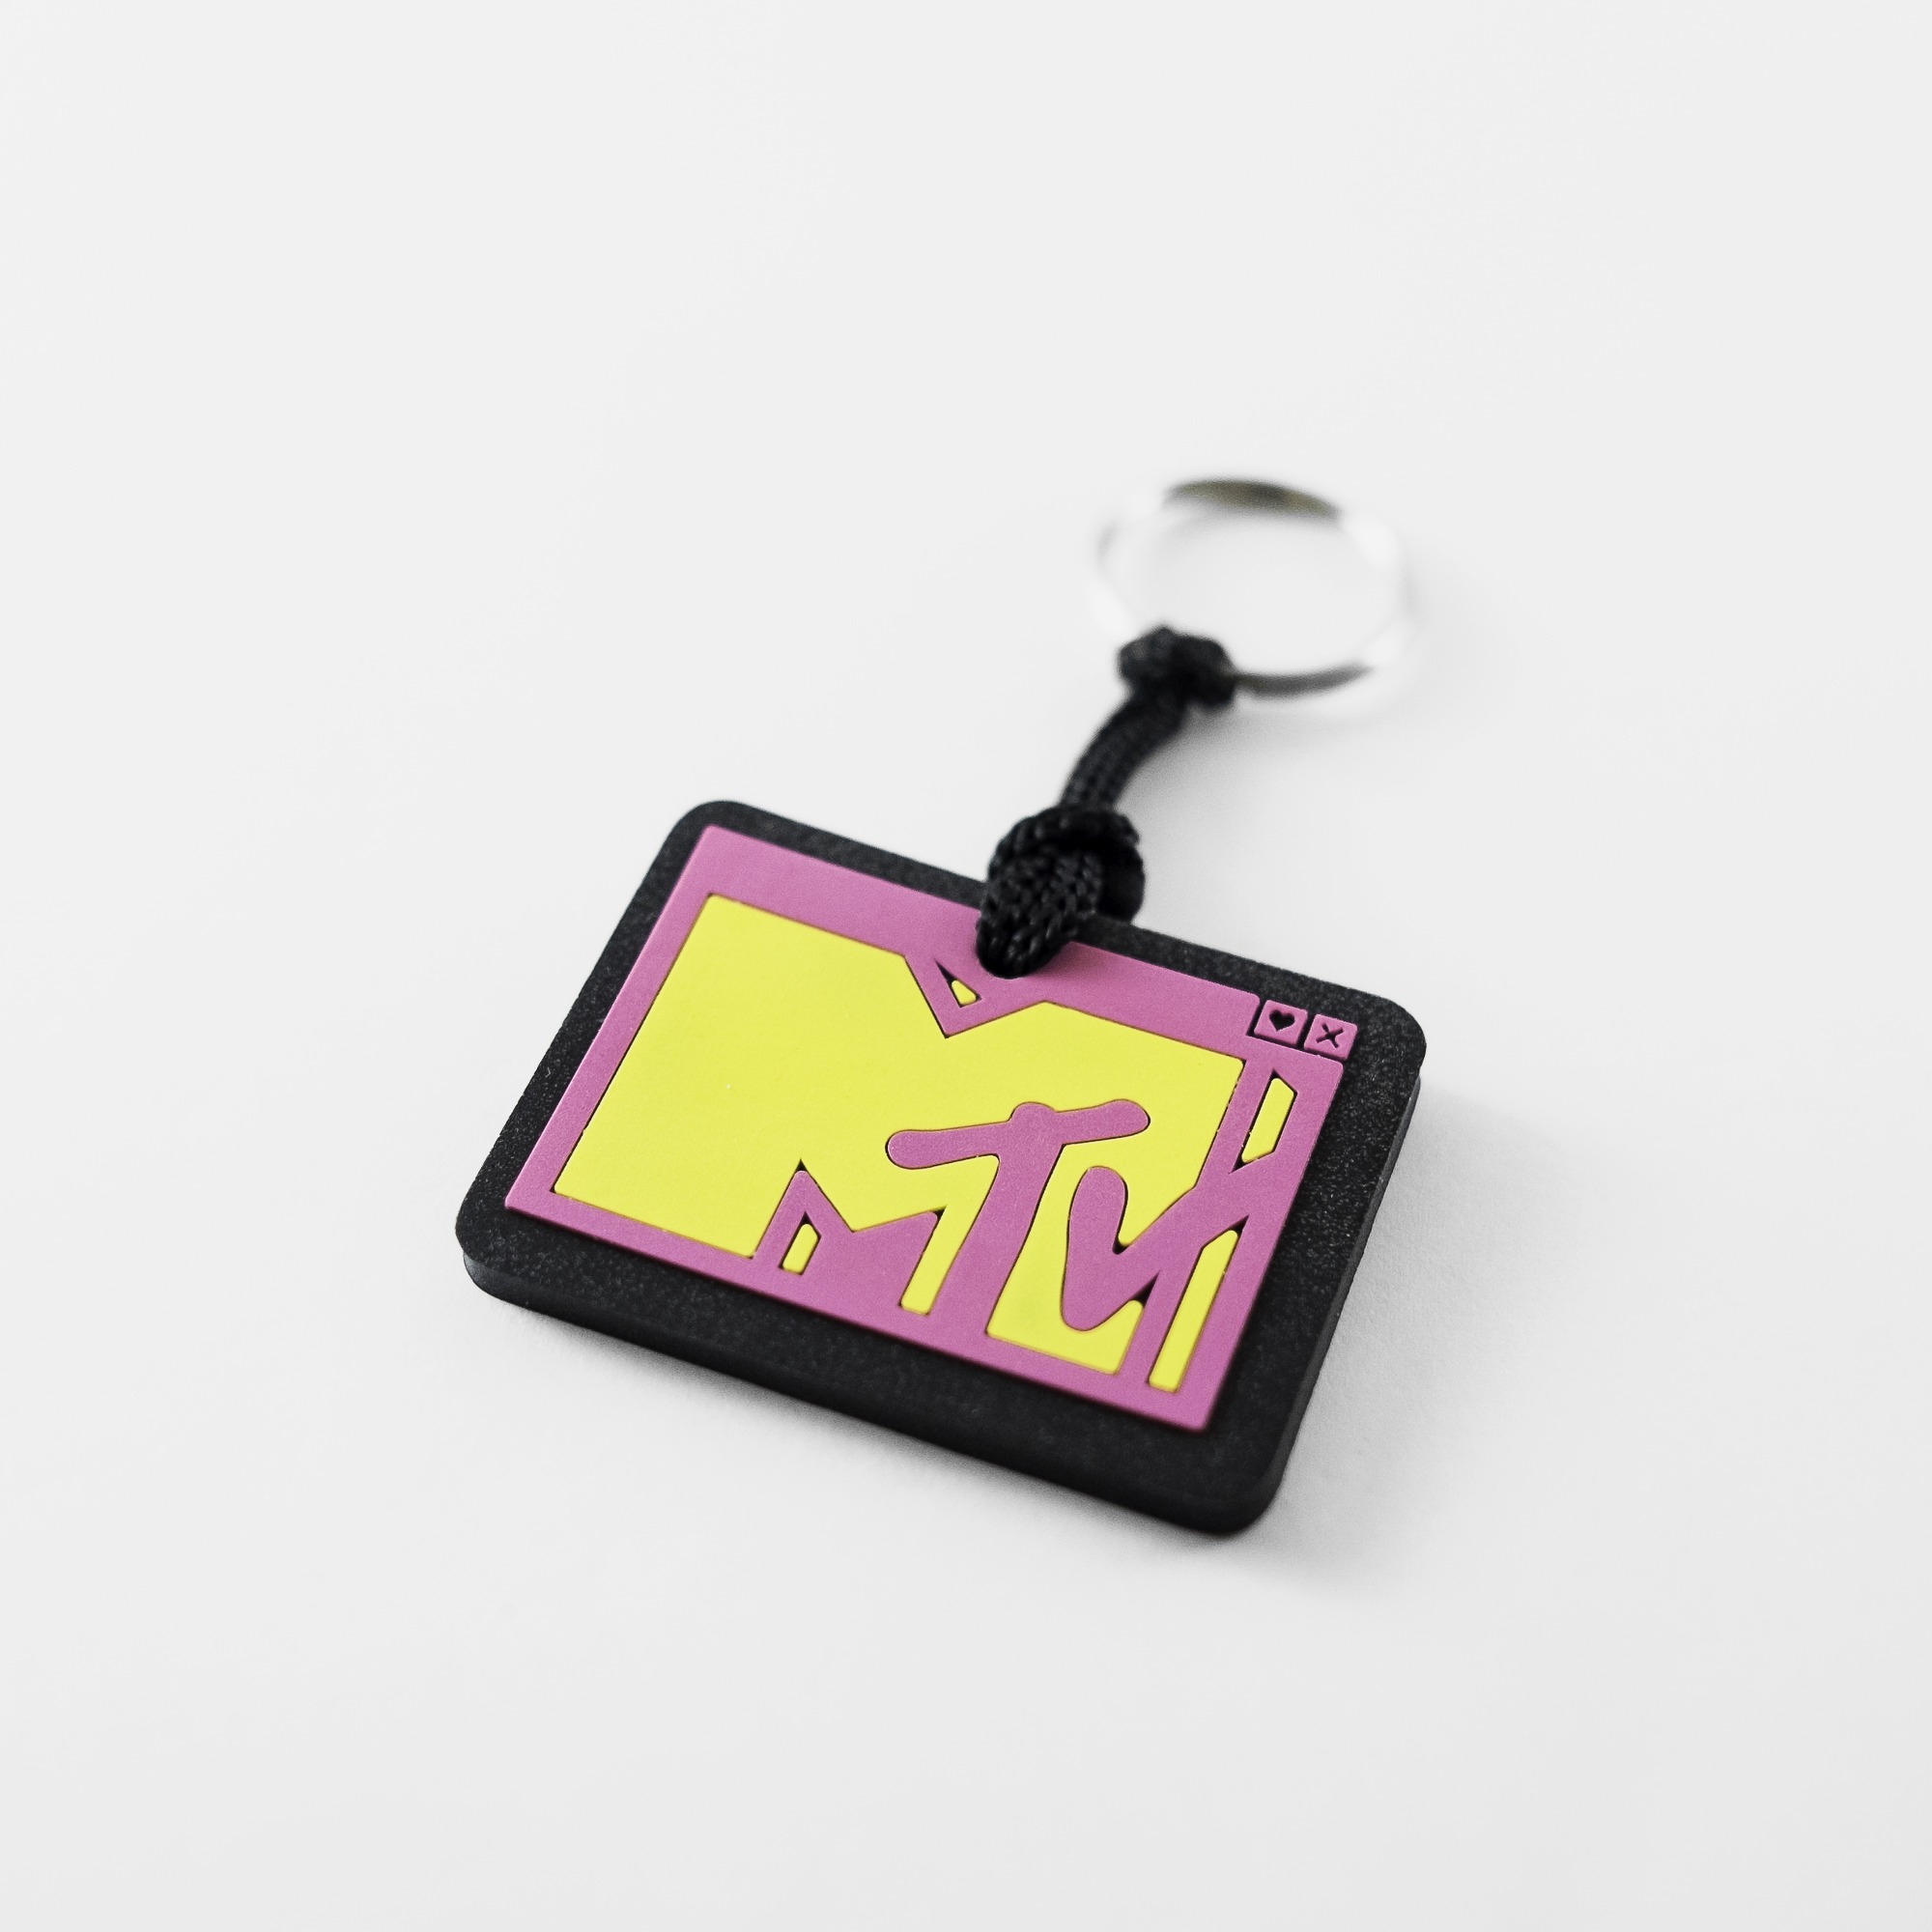 chaveiro emborrachado MTV relevo